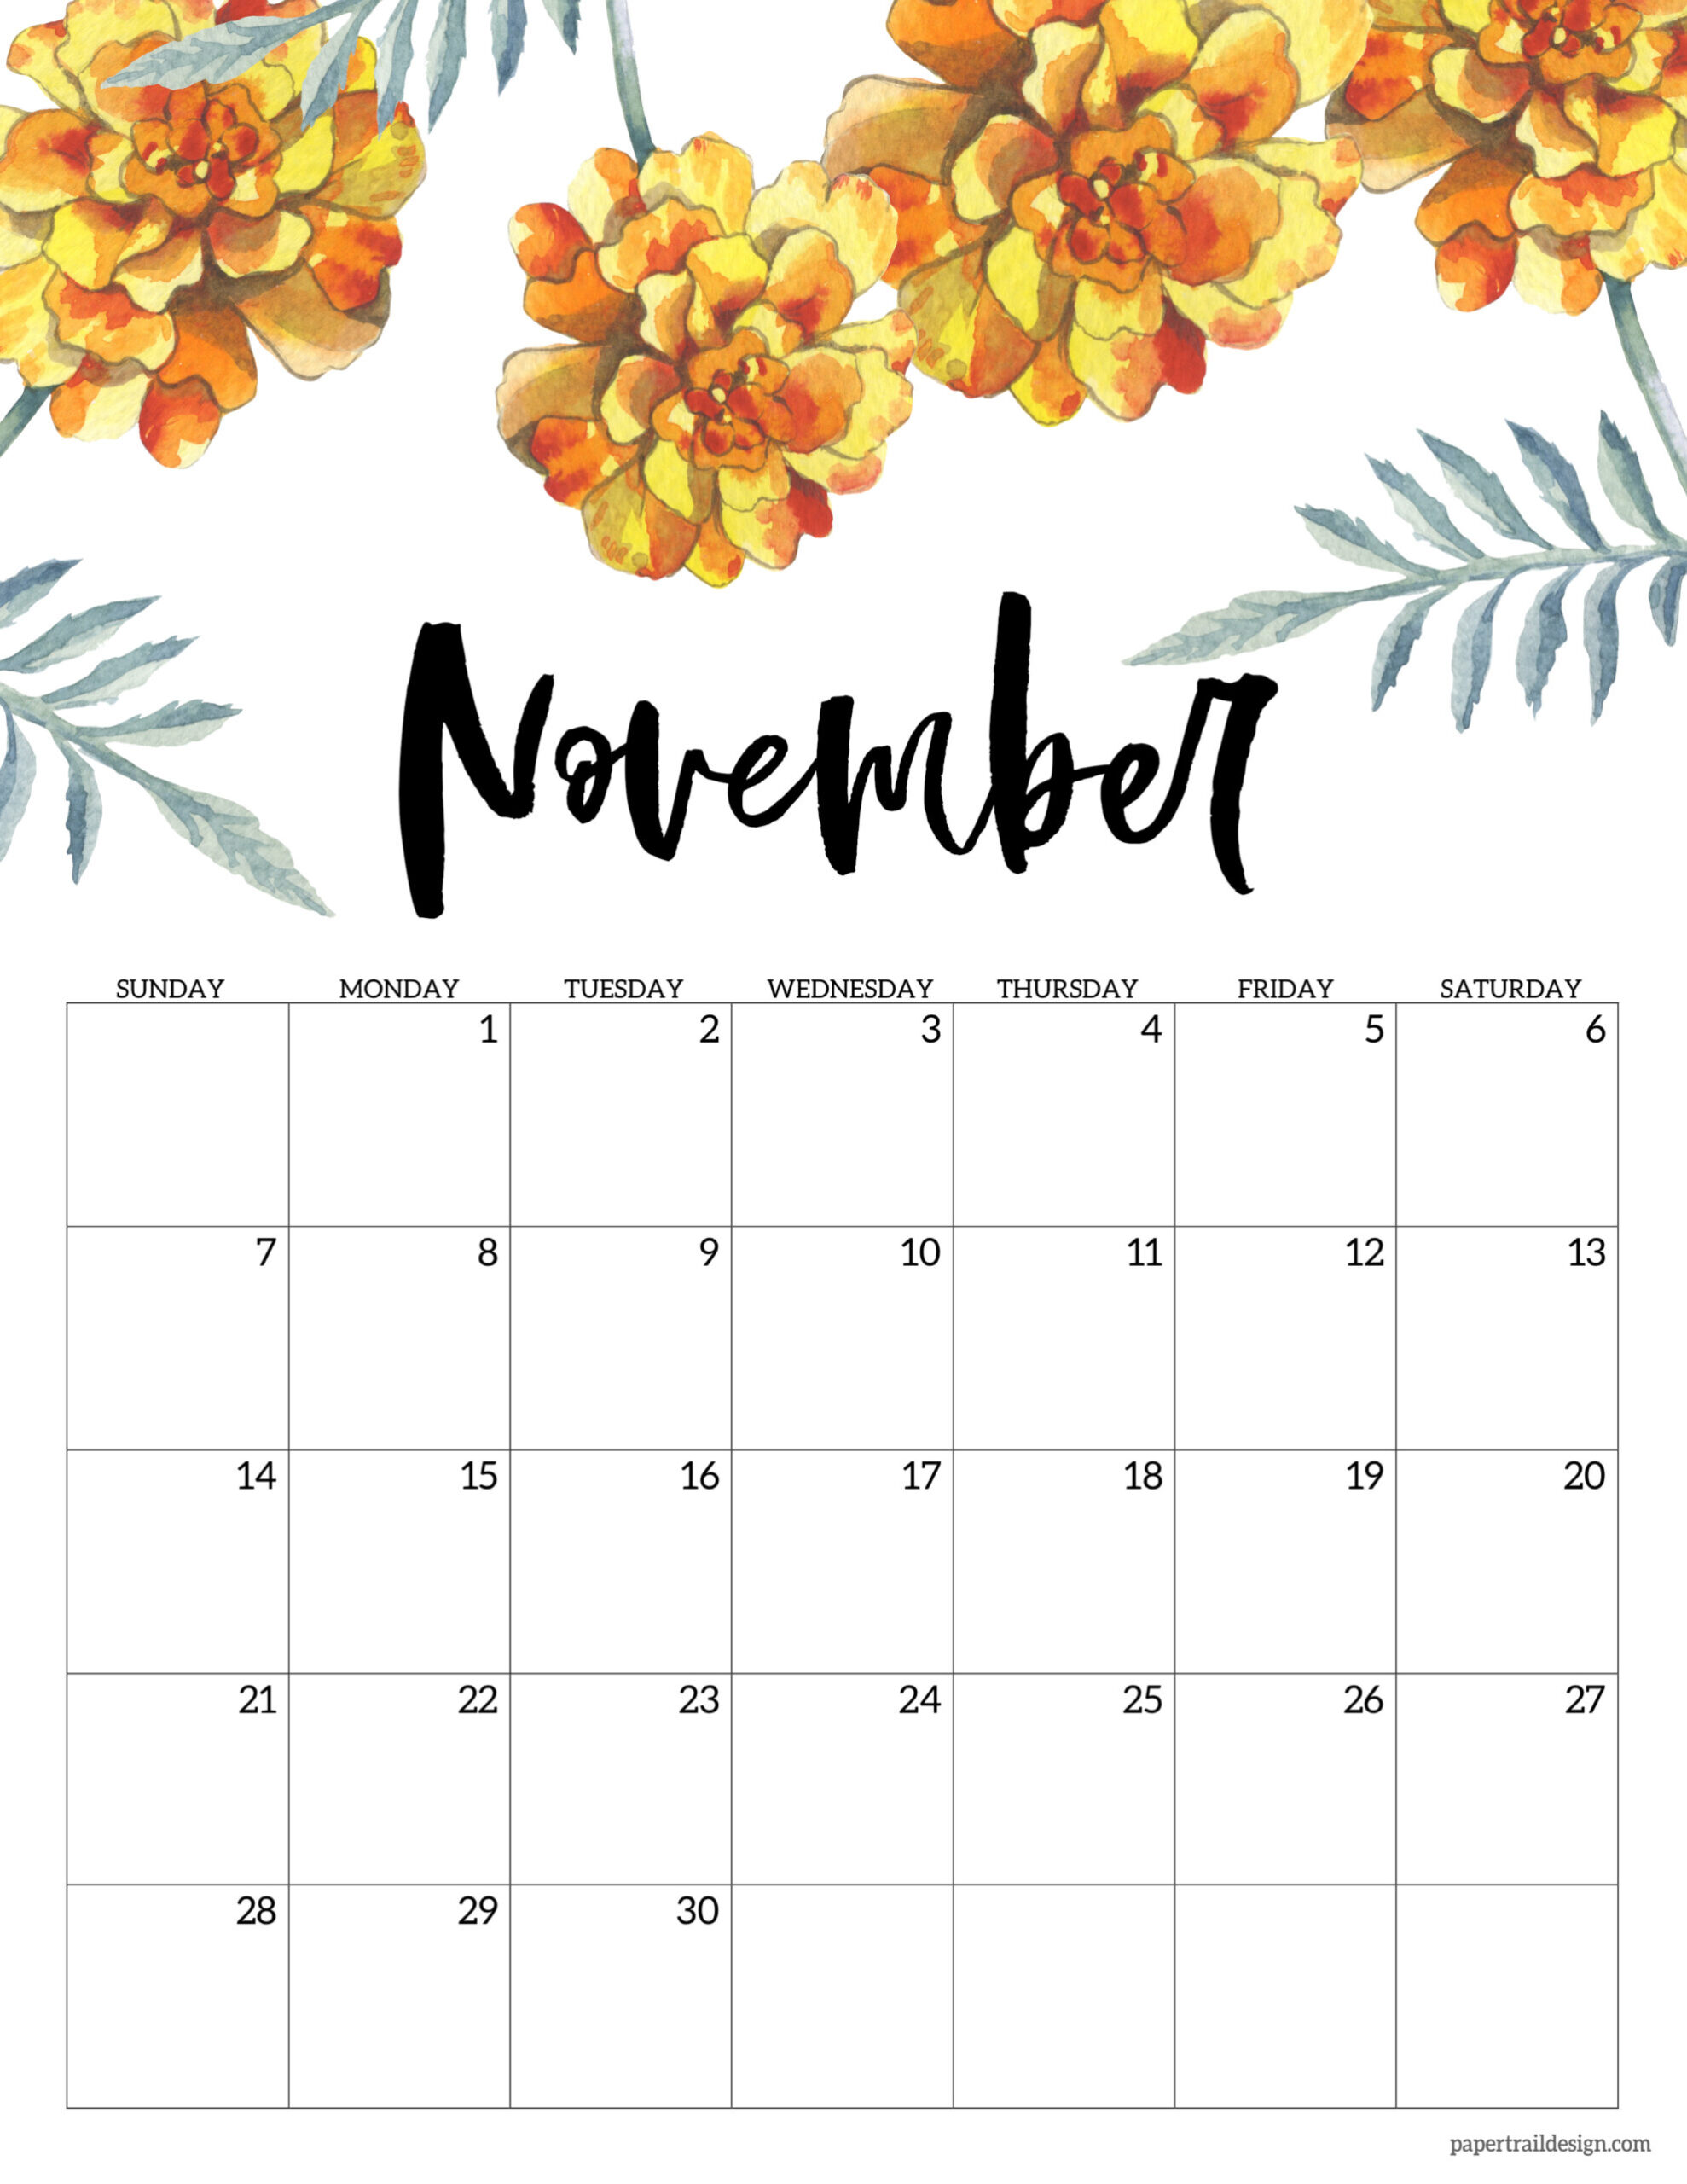 Free Printable Calendar 2021 - Floral | Paper Trail Design